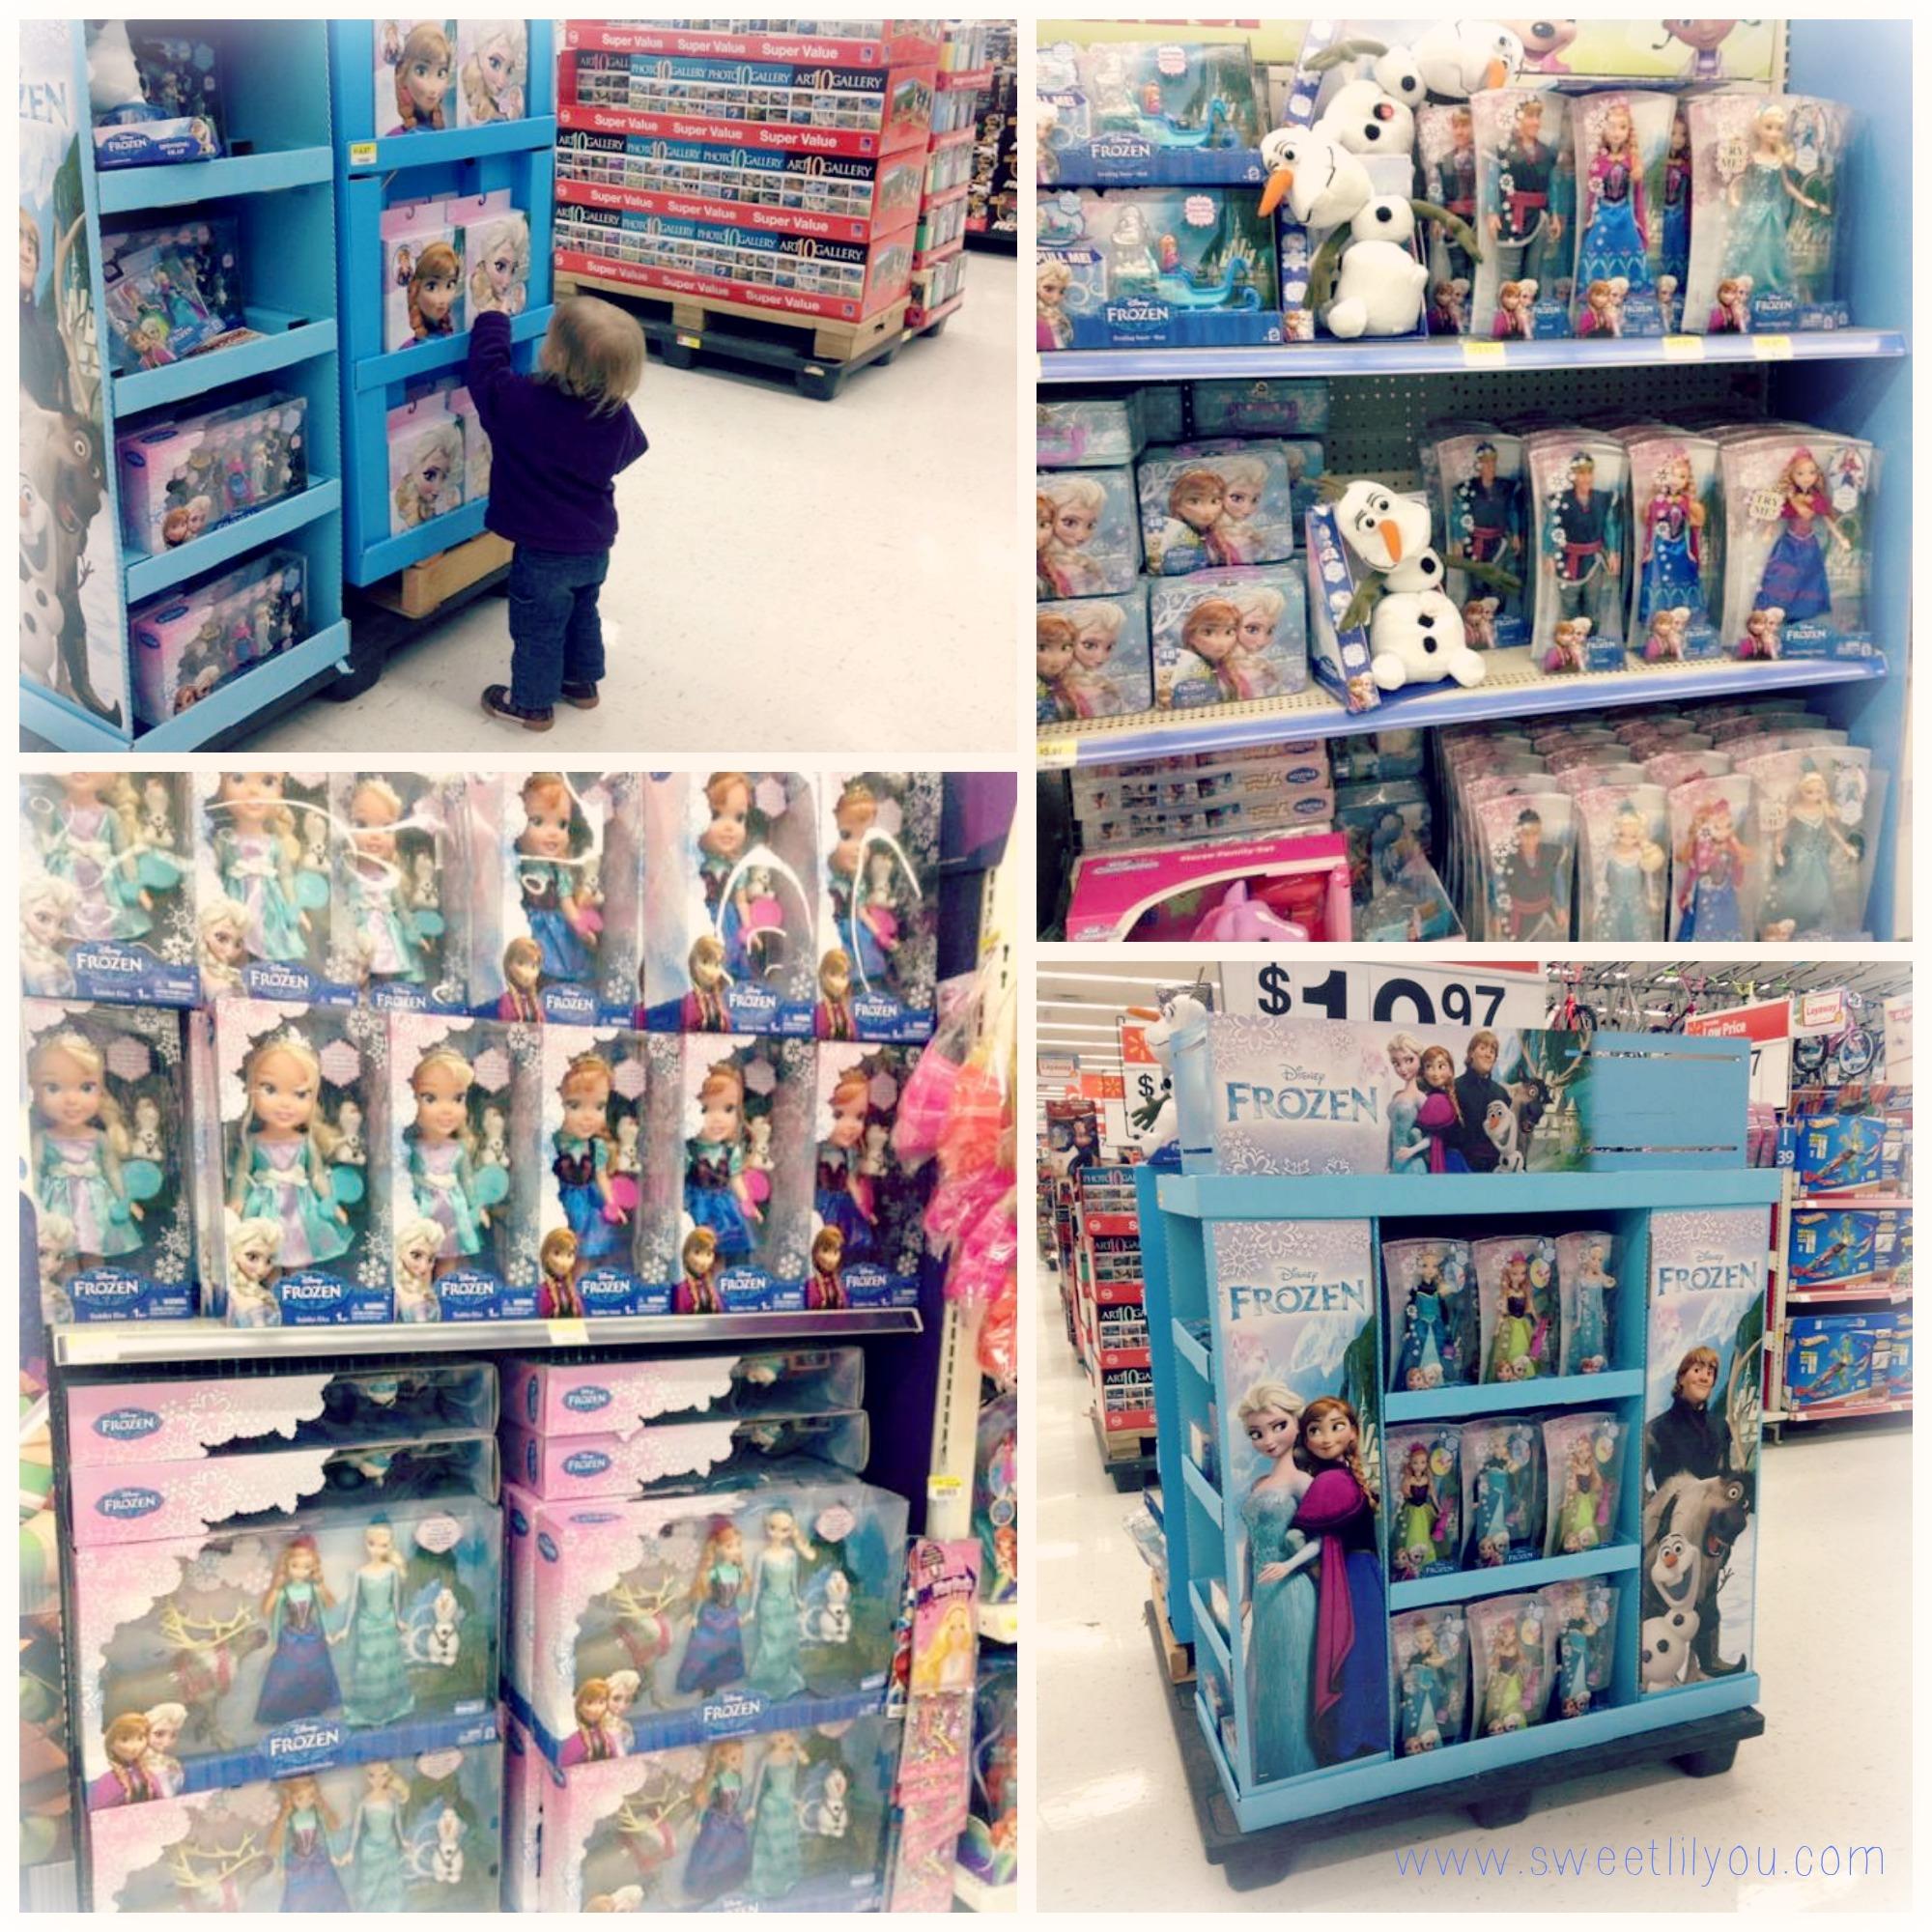 Frozen Disney Merchandise At Walmart Subway FrozenFun Shop Cbias